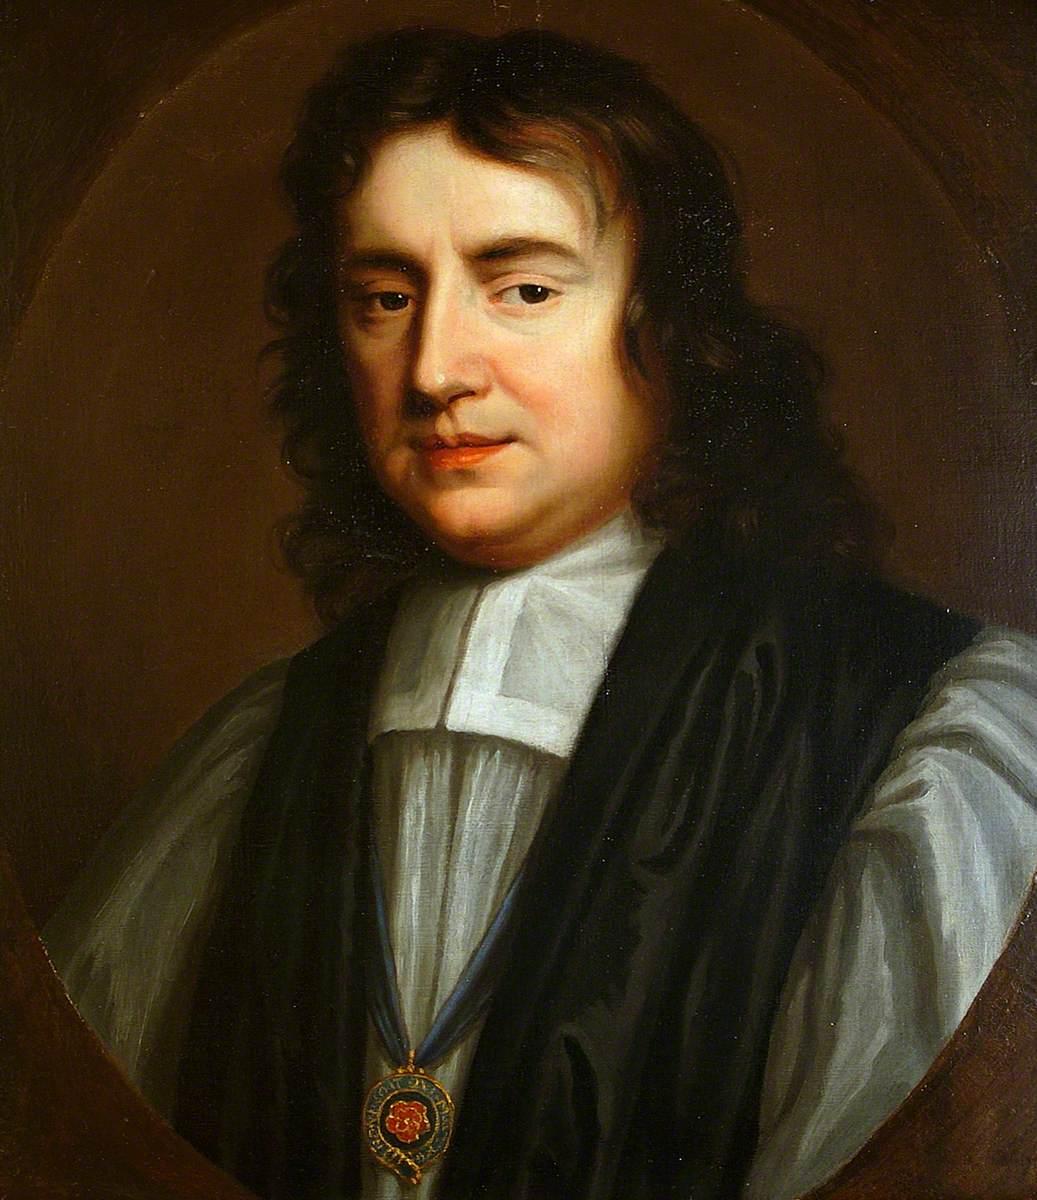 Gilbert Burnet (1643–1715), DD, Bishop of Salisbury, Theologian and Historian